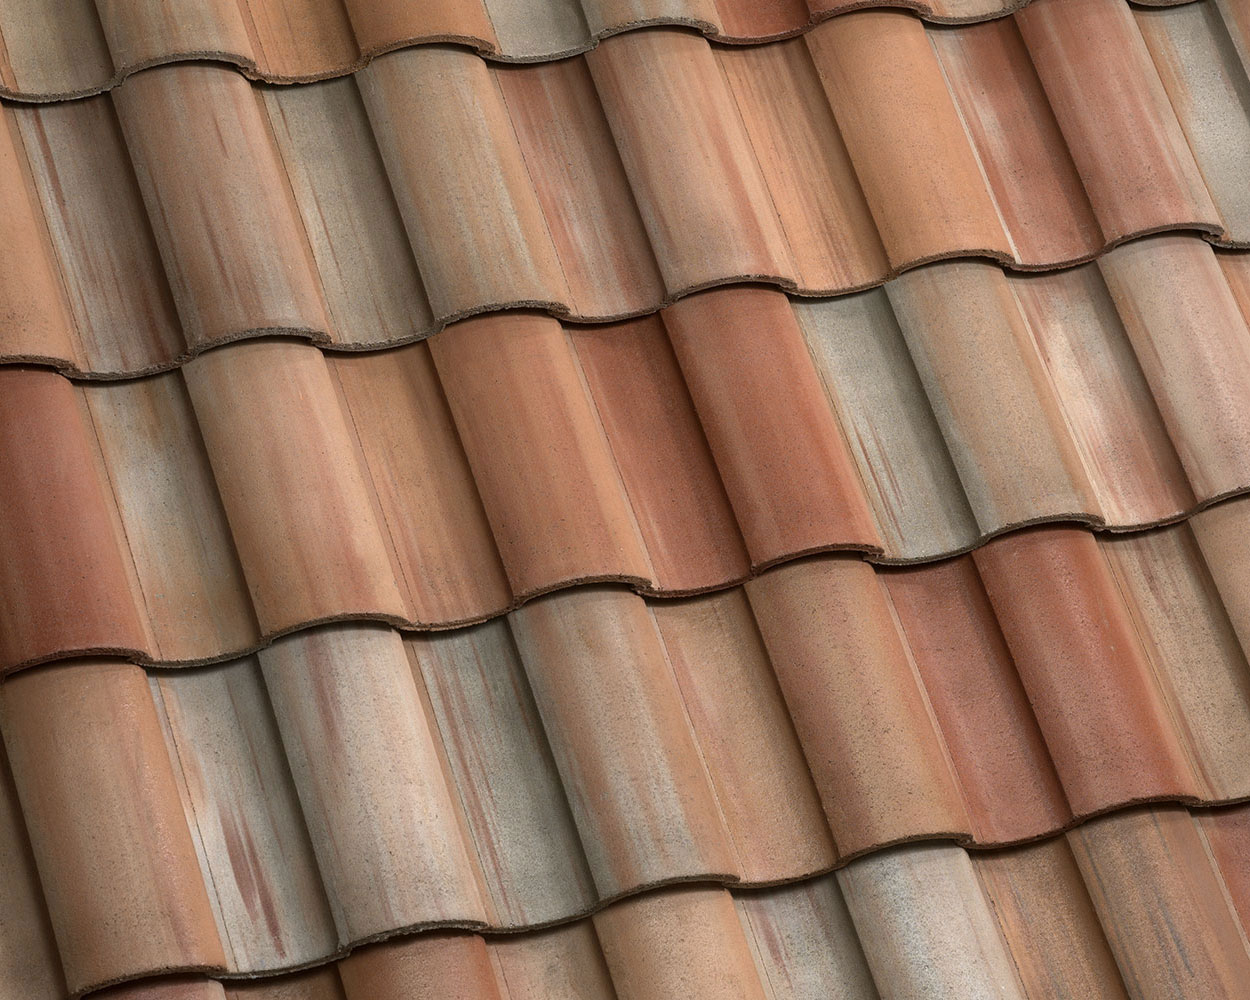 Juno blend tile roof color swatch